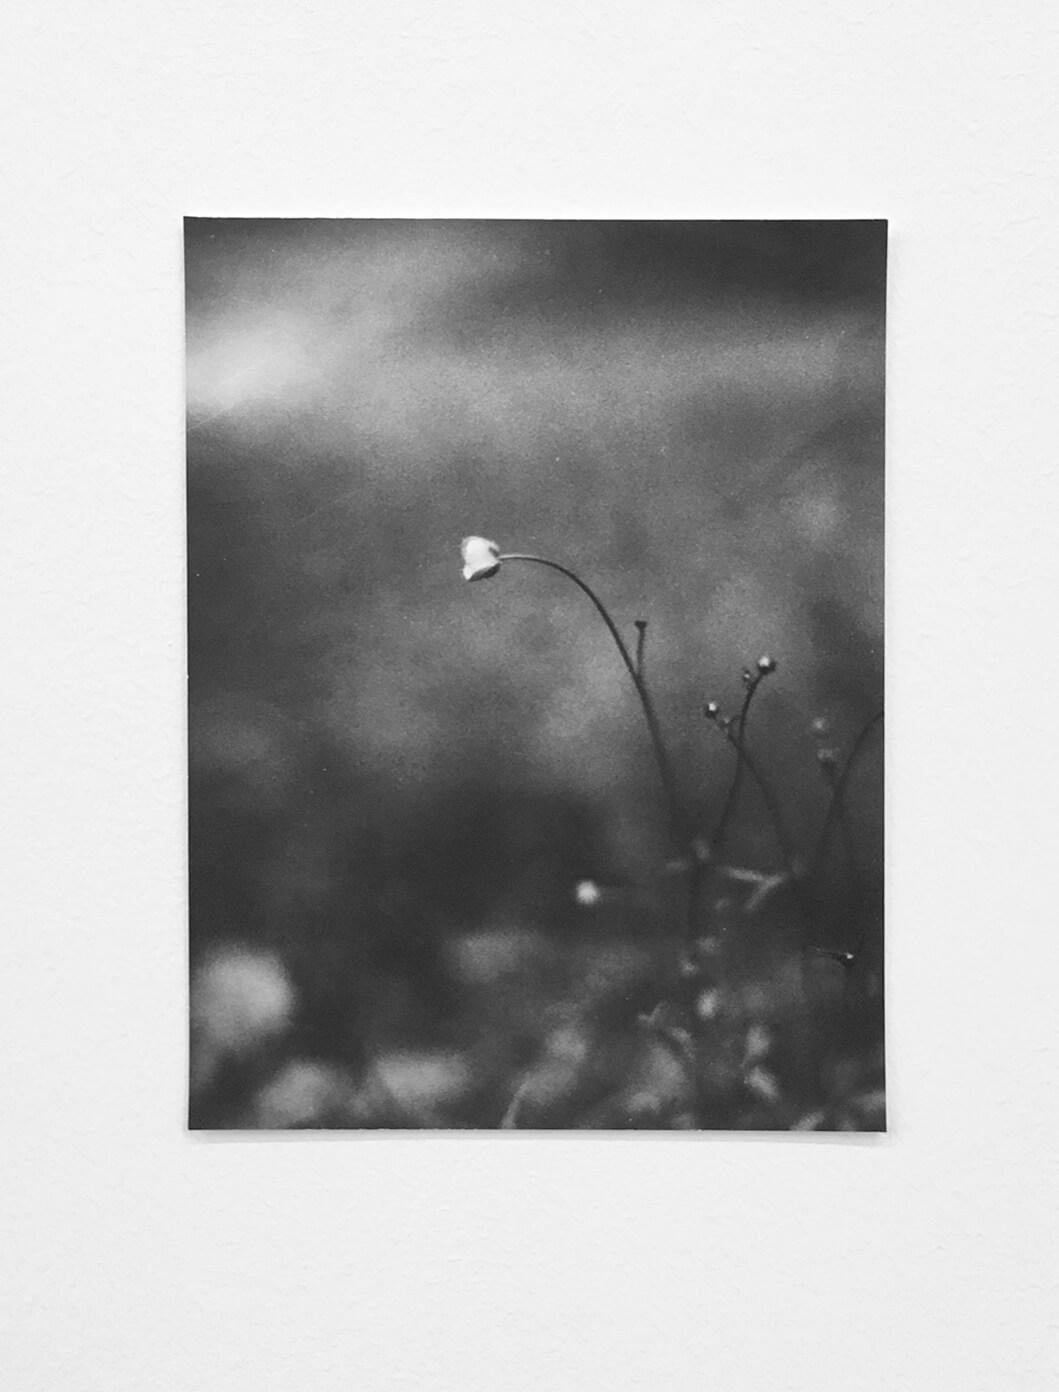 Untitled (Sleeping Flower), 2018 |  | ProjecteSD